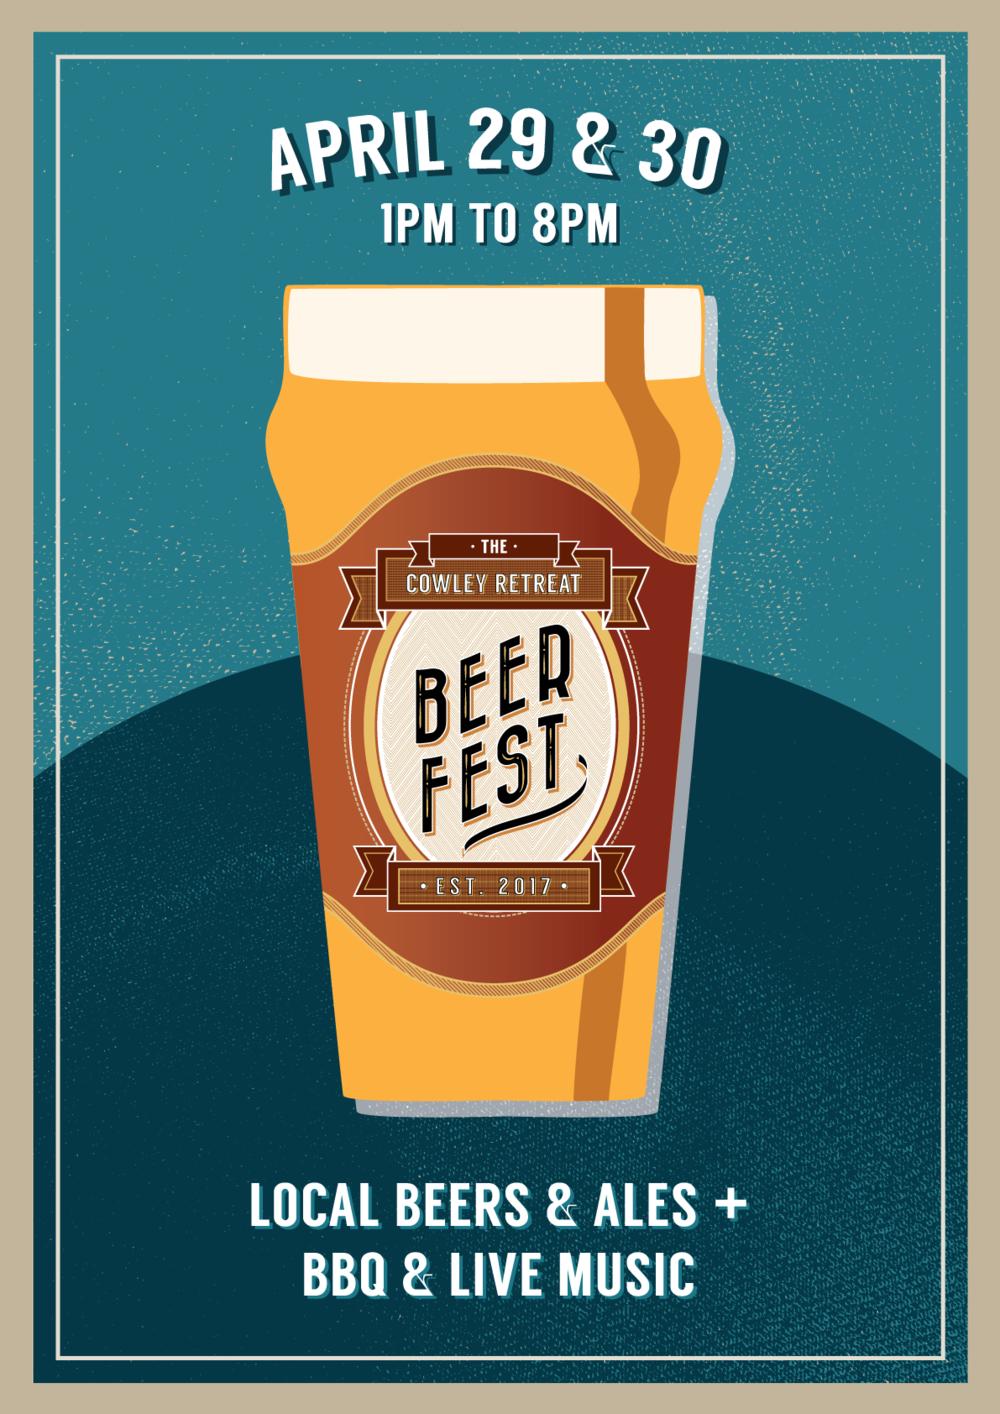 The Cowley Retreat Beer Festival